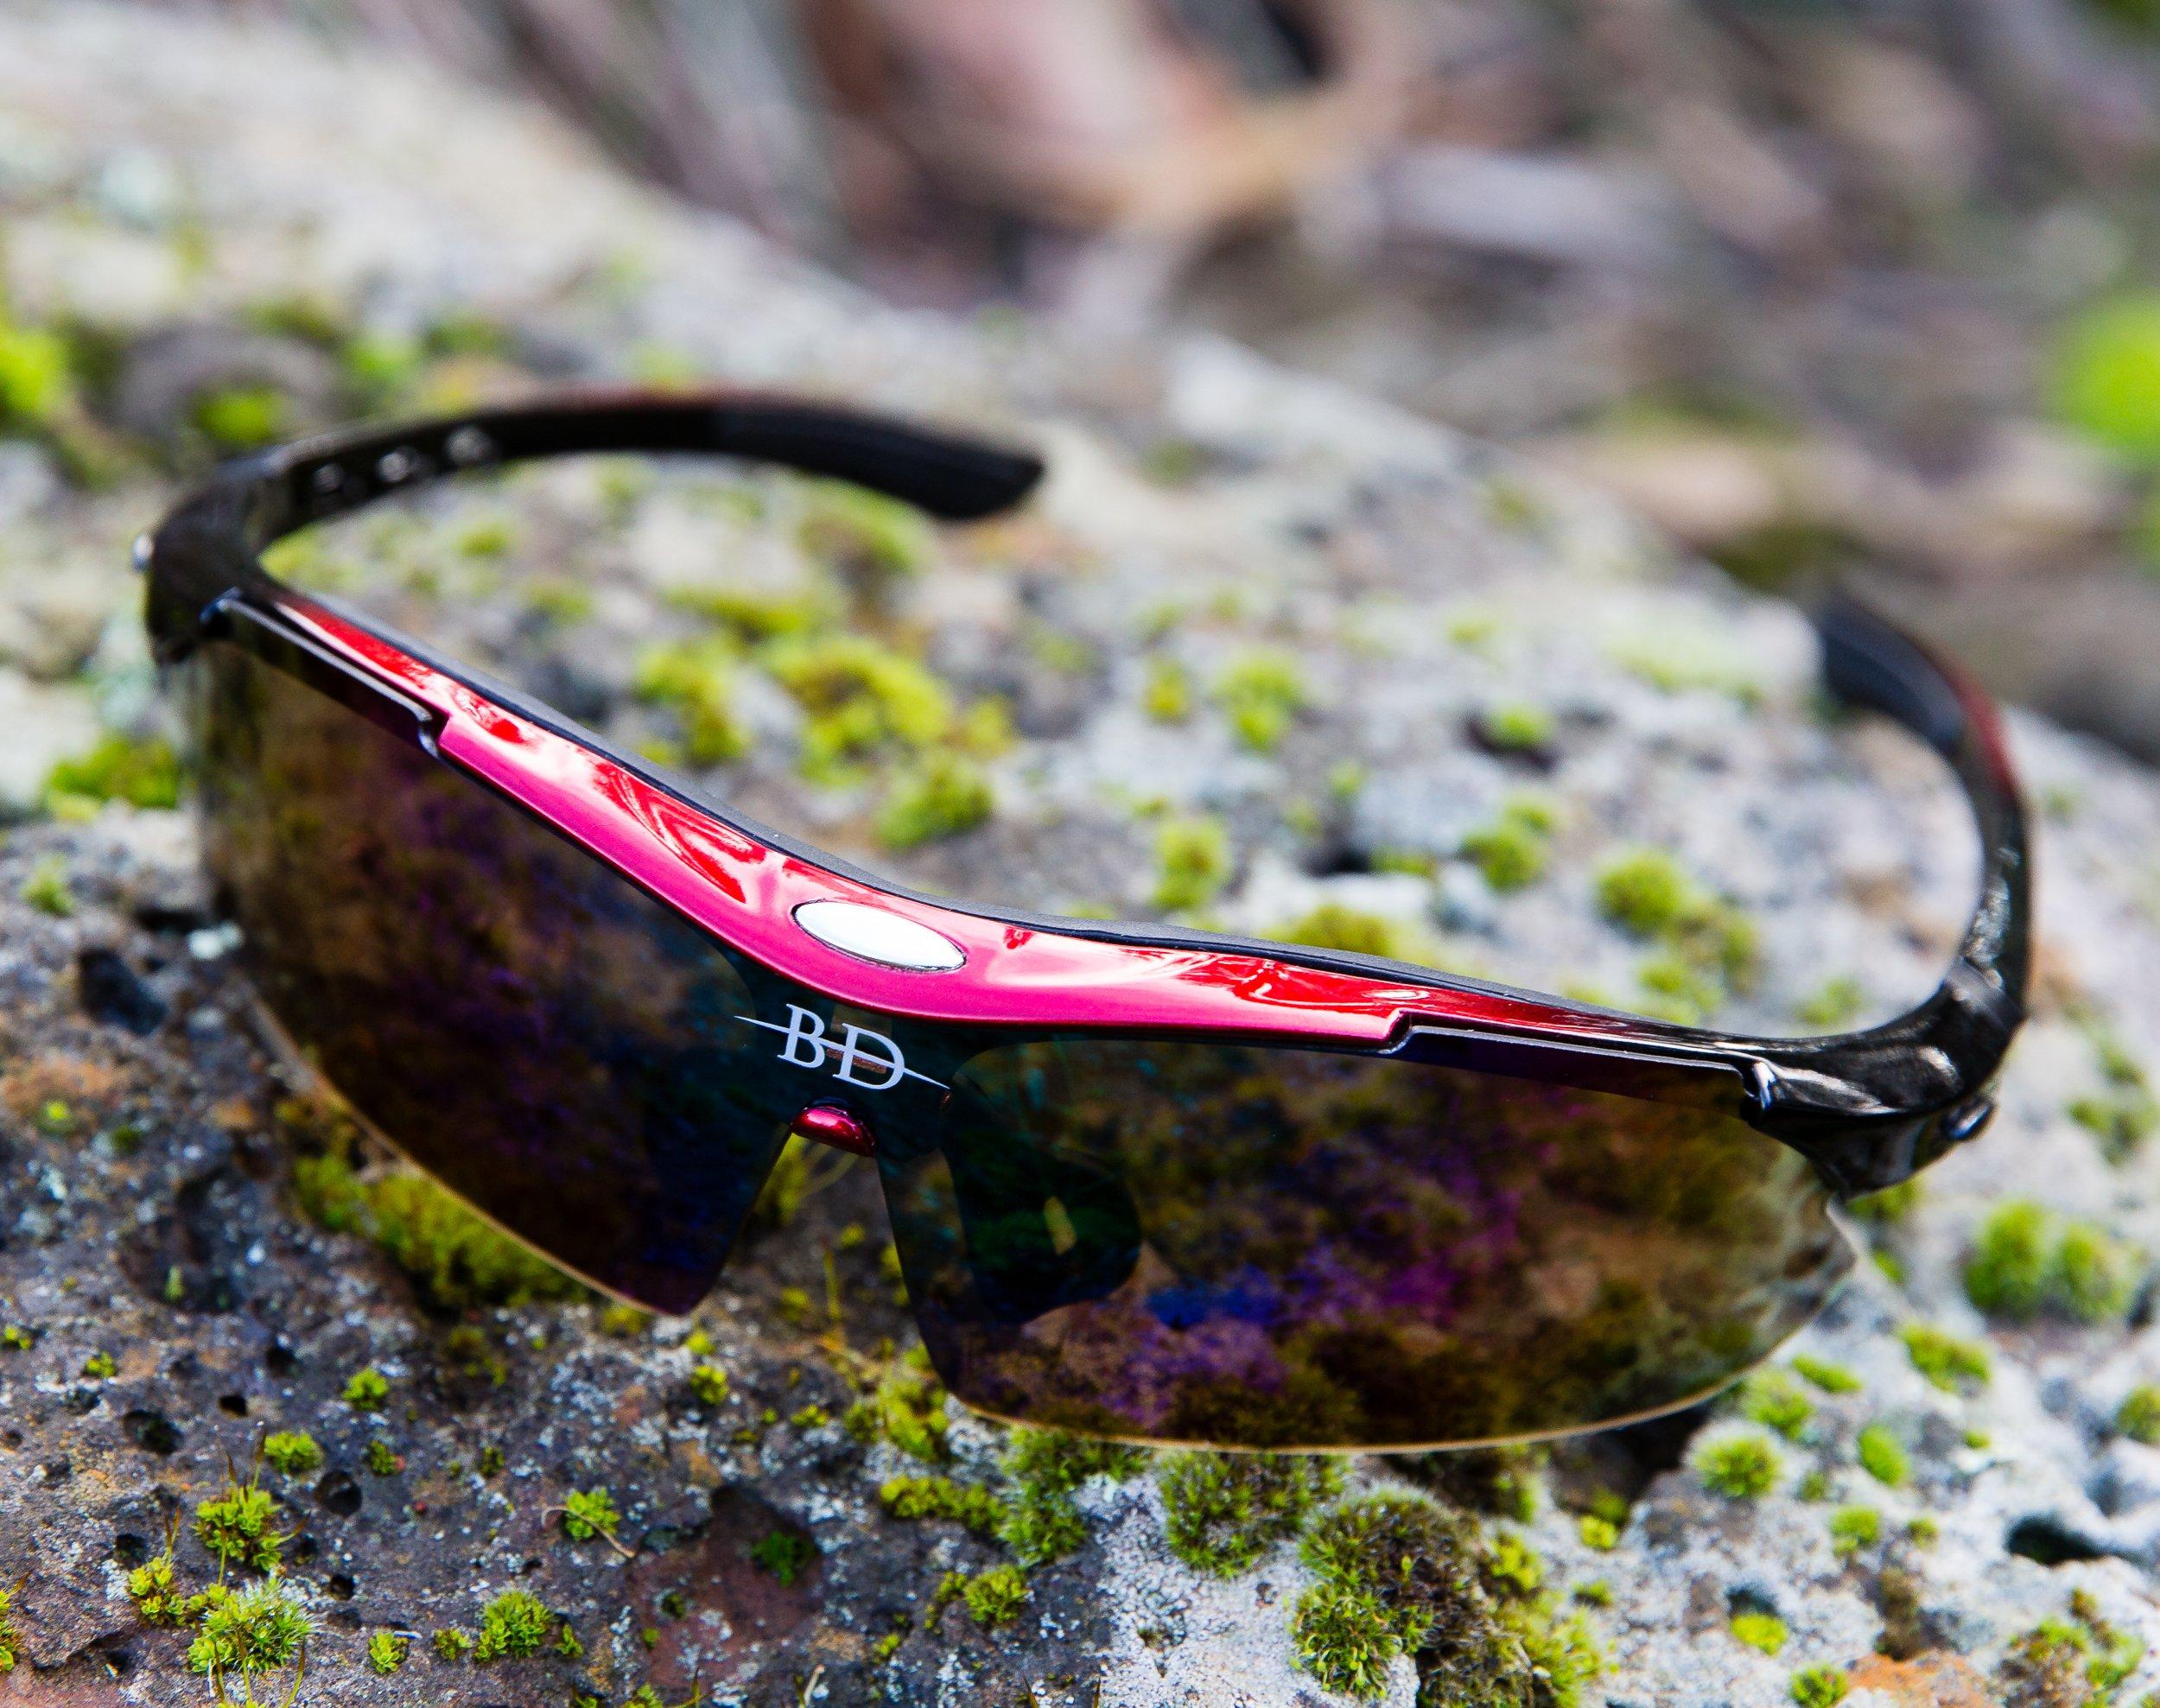 0f0bab306d Sports Sunglasses 5 Interchangeable Lenses Polarized Lens Cycling Glasses  UV400 Protection Men Women Bike Riding Running